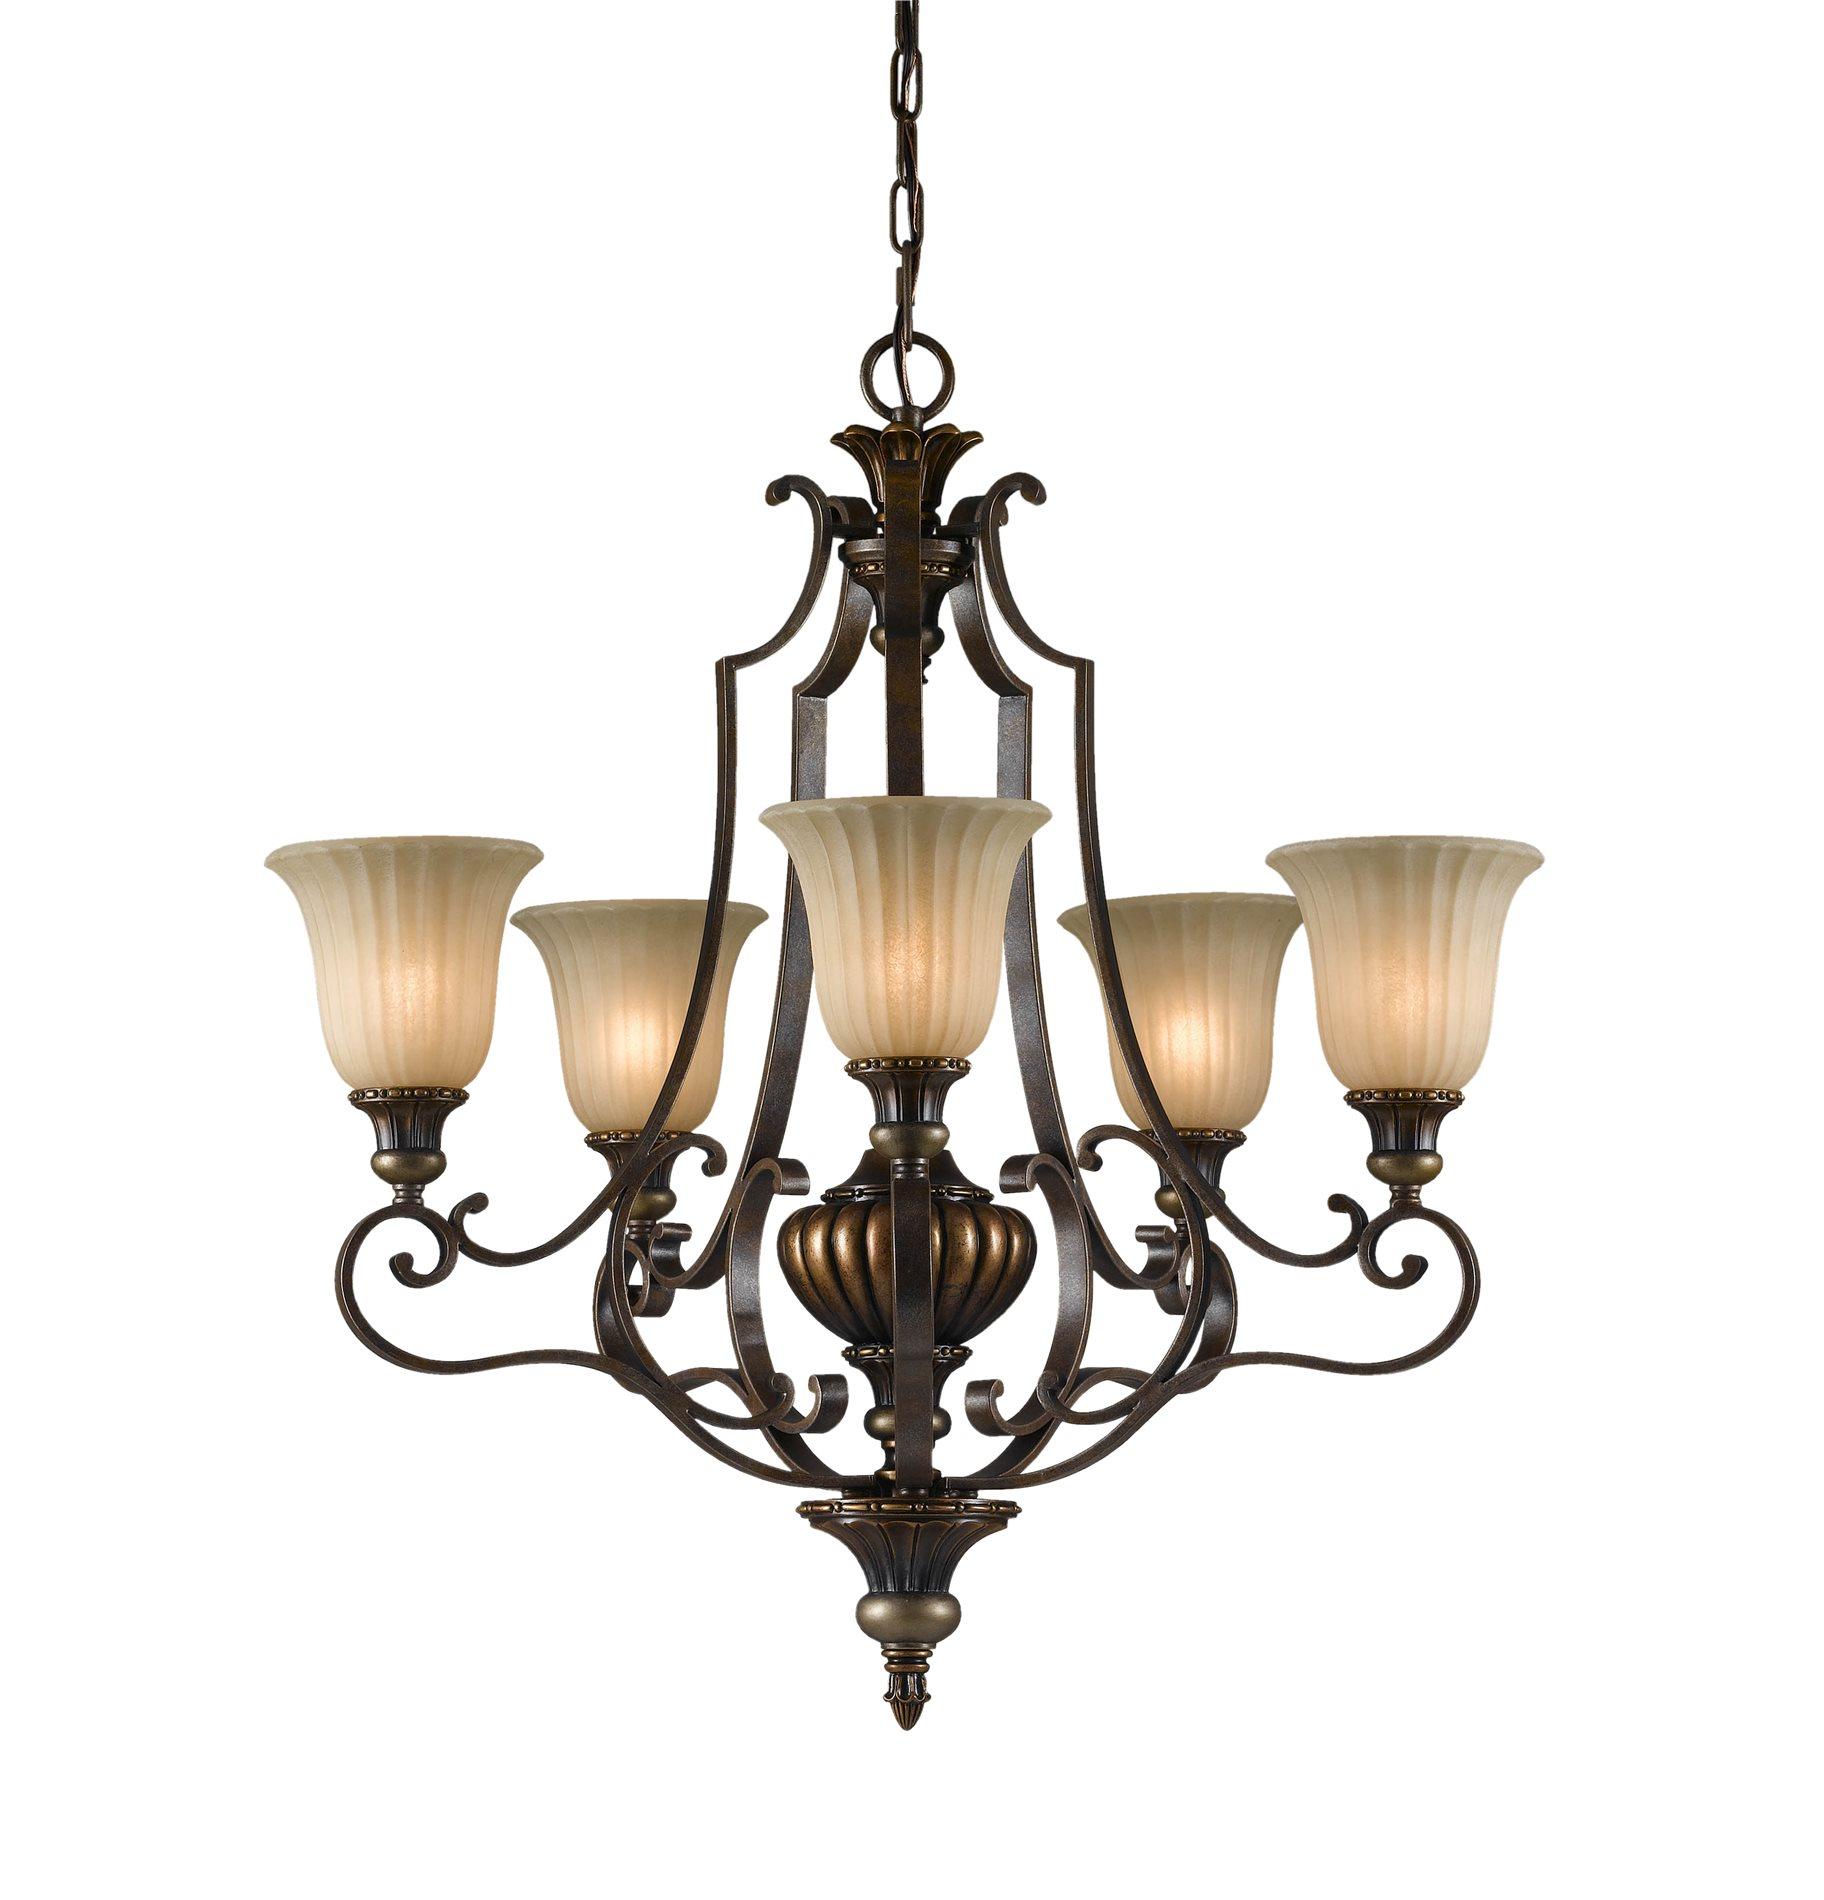 Discount Murray Feiss Lighting: Murray Feiss F2503/5FG/BRB Kelham Hall Traditional